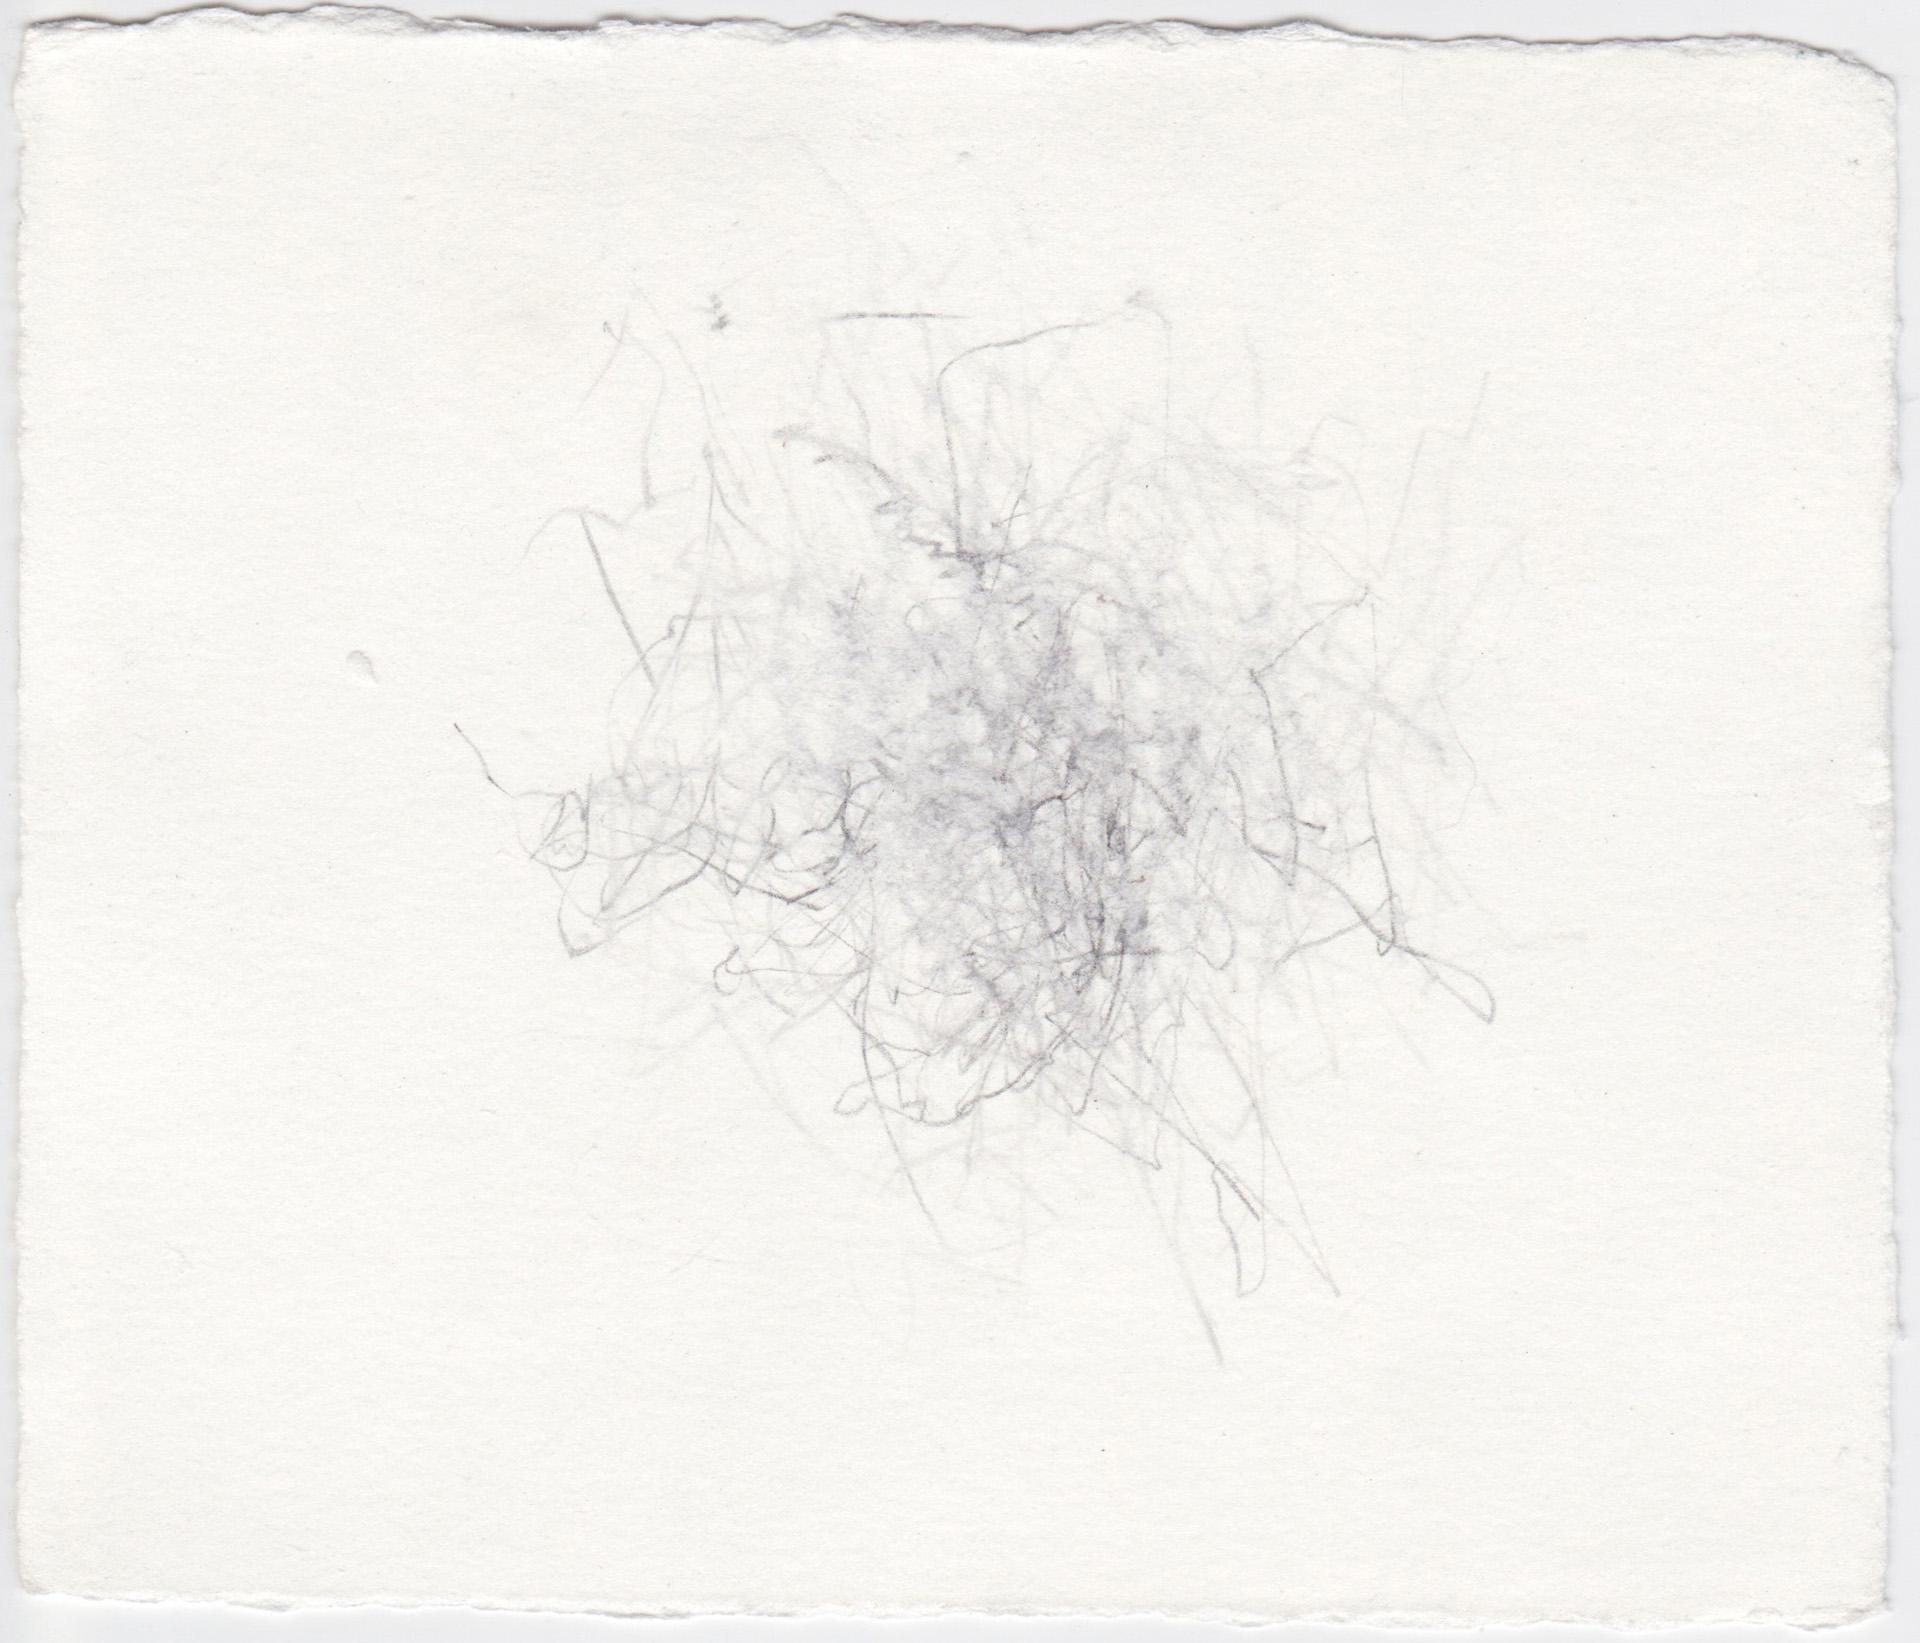 Ocean Drawing 005